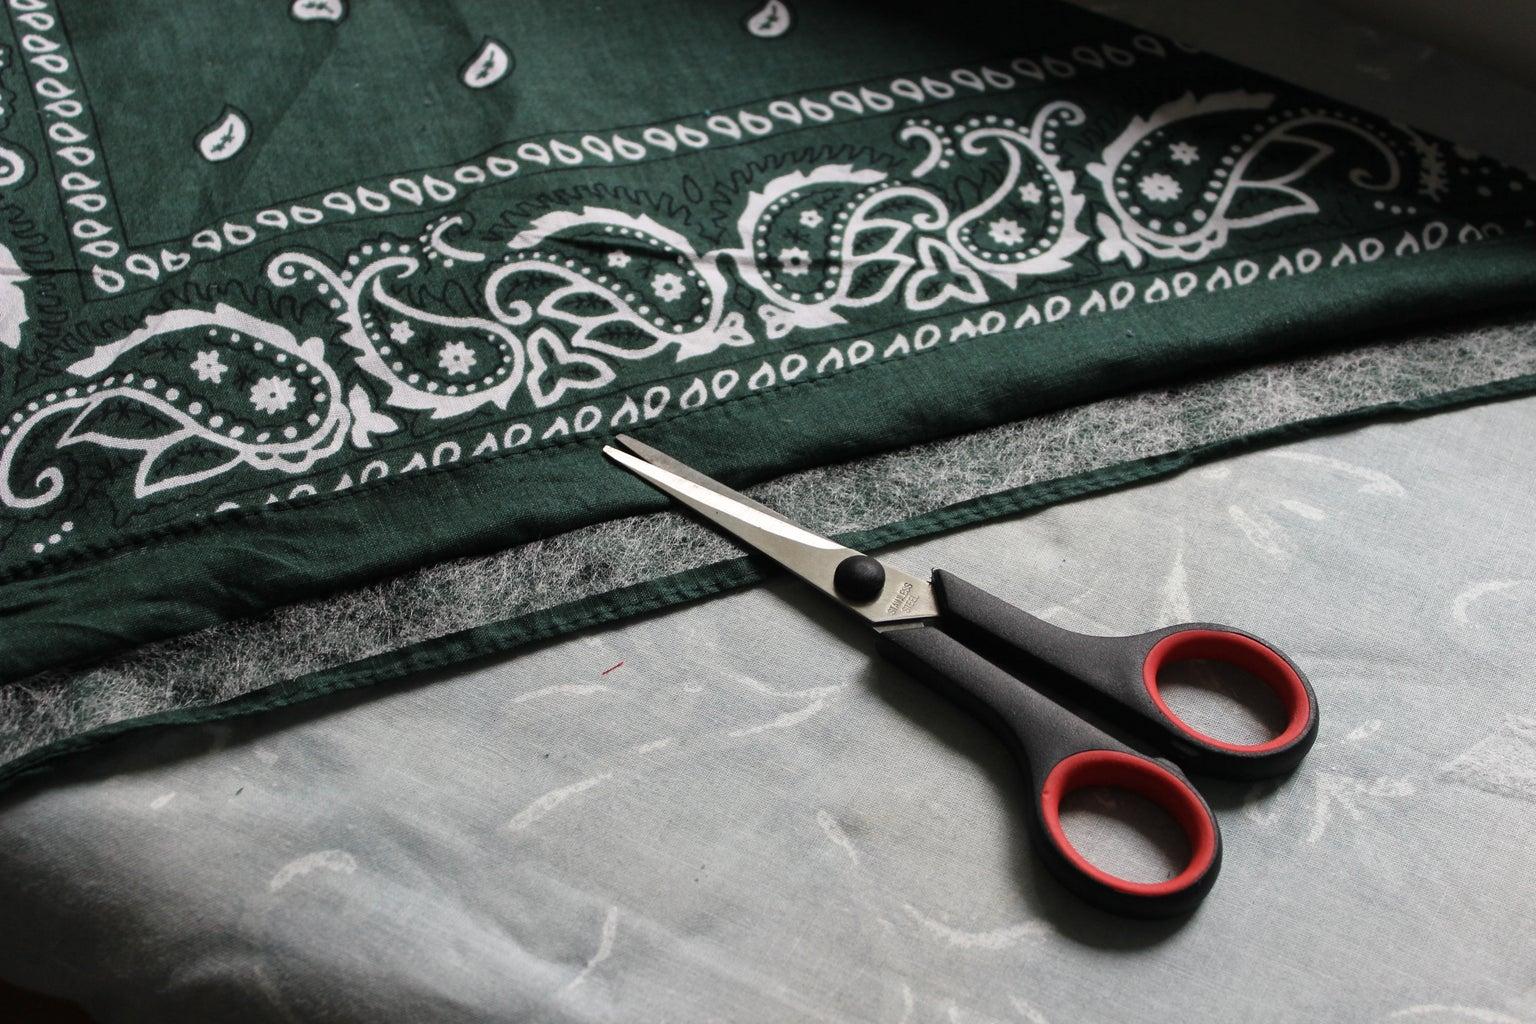 Bandana Roll Up Design Part 1: Iron and Fold